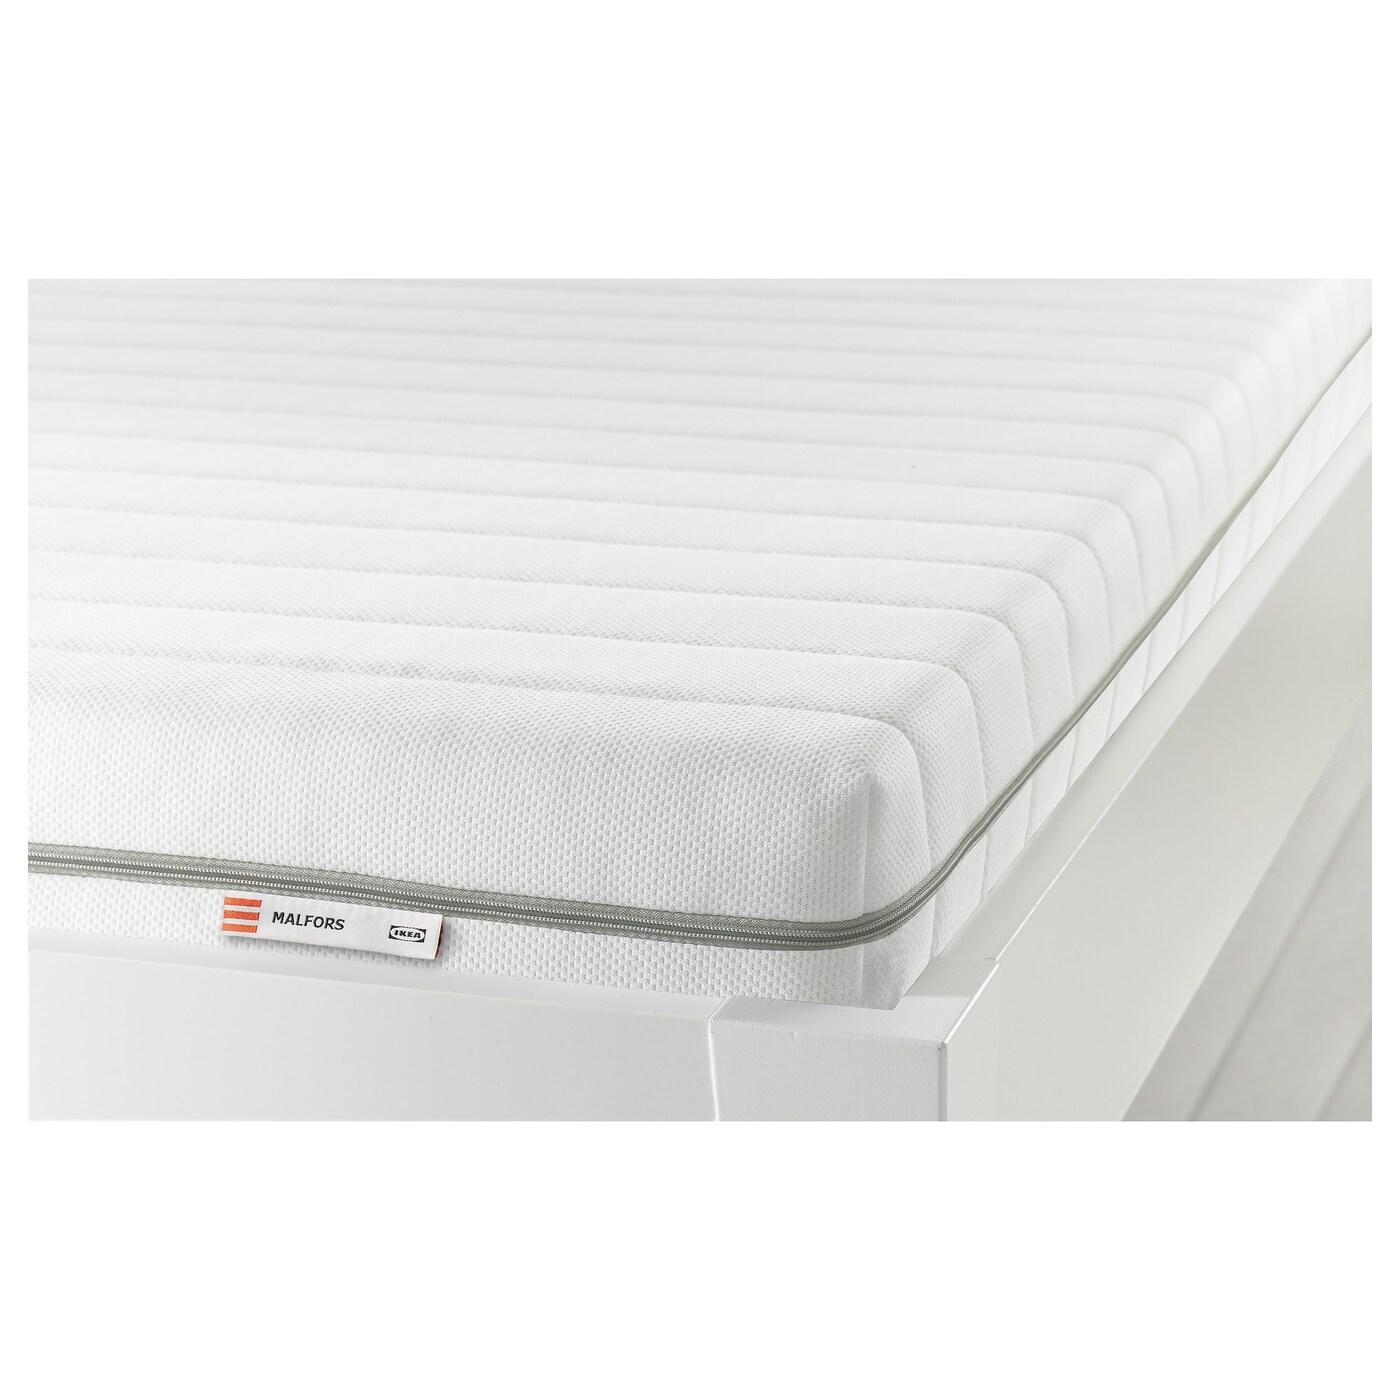 Malfors Foam Mattress Firm White Ikea